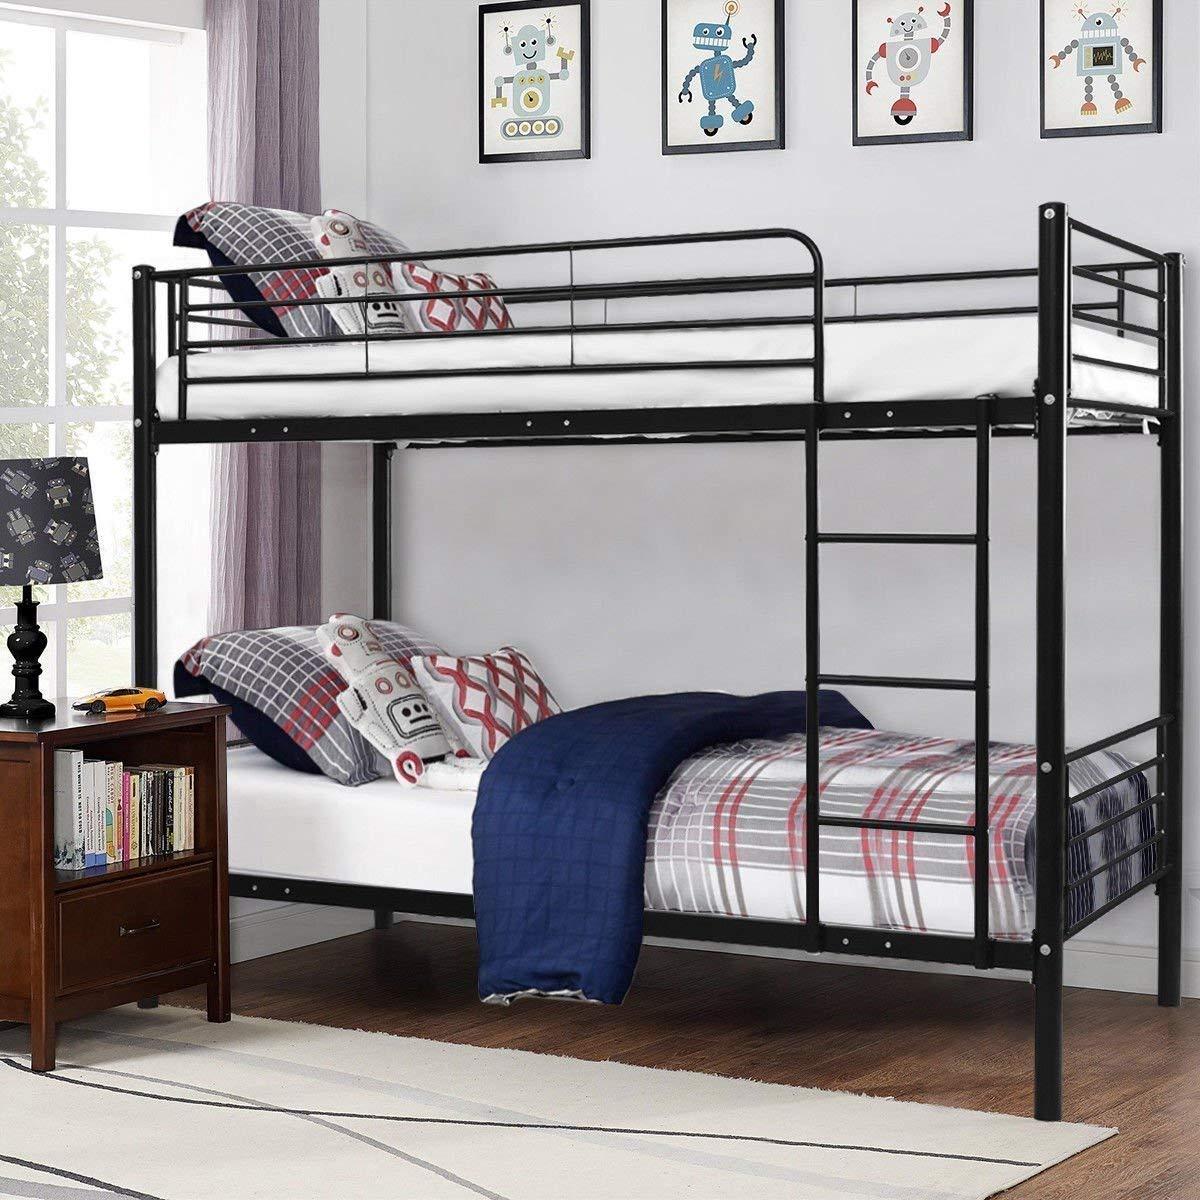 Costzon Twin Over Twin Loft Bed, Metal Frame with Ladder Guard Rail for Boys & Girls Teens Kids Bedroom Dorm (Black)